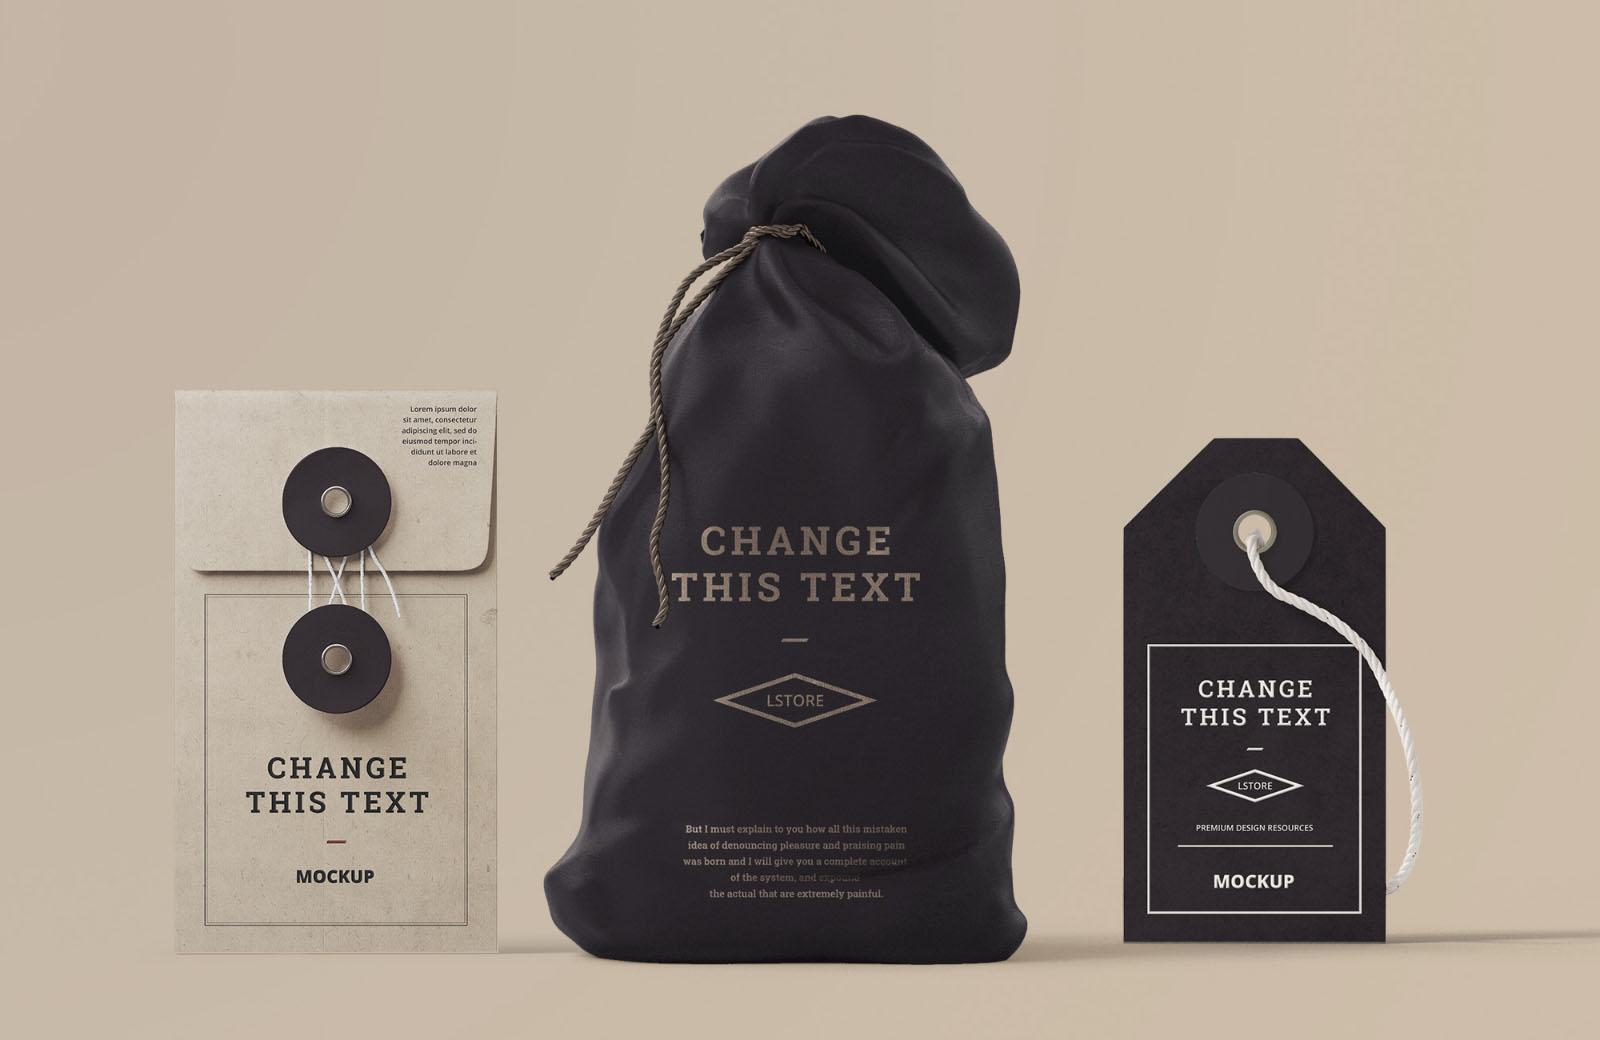 Bag Mockup with Box and Tag